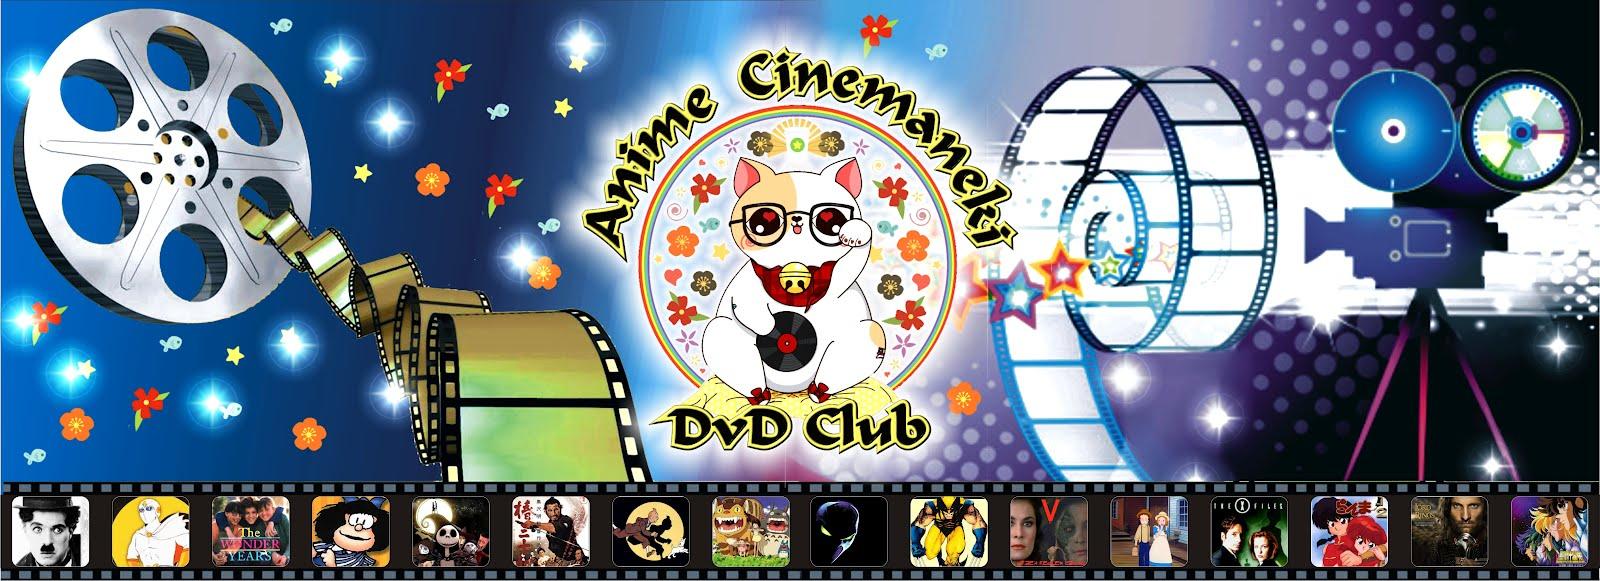 "Animé Cinemaneki - DVD Club               ""Películas - Series - Animación"""